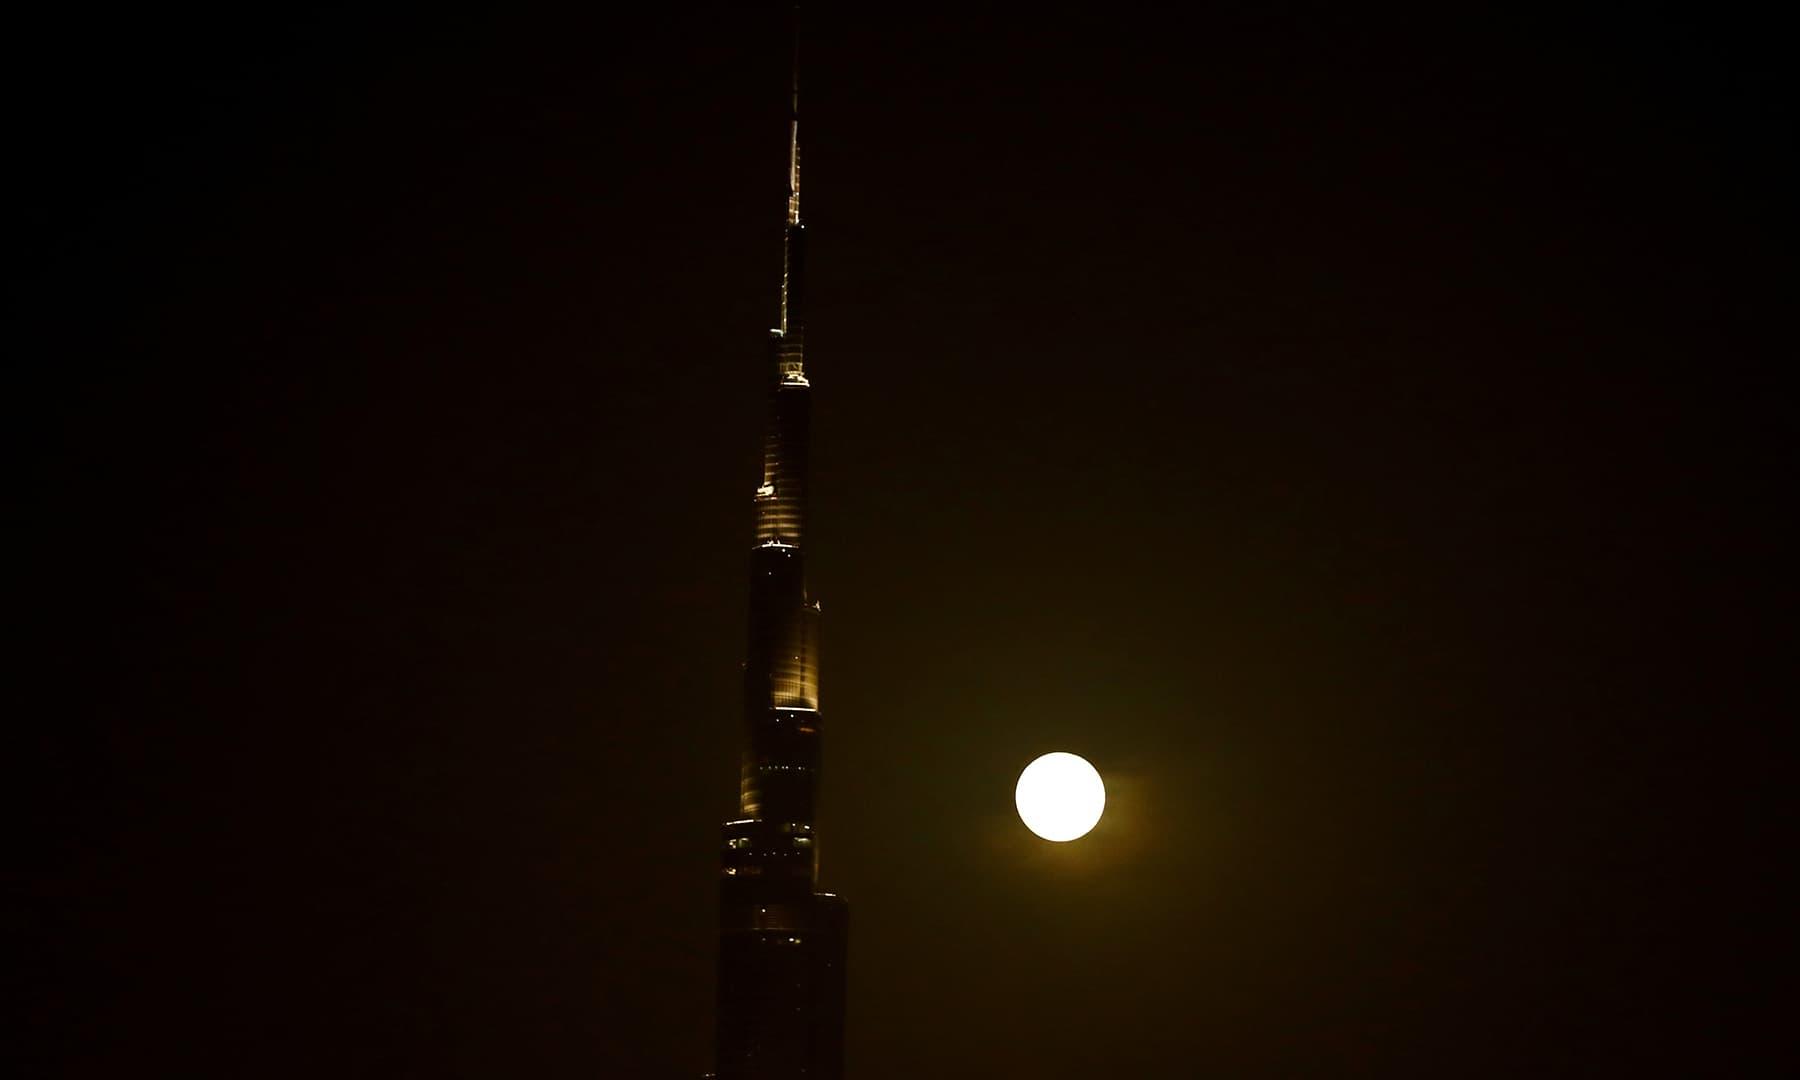 The full moon rises next to Burj Khalifa, the world's tallest building, in Dubai, United Arab Emirates. — Reuters